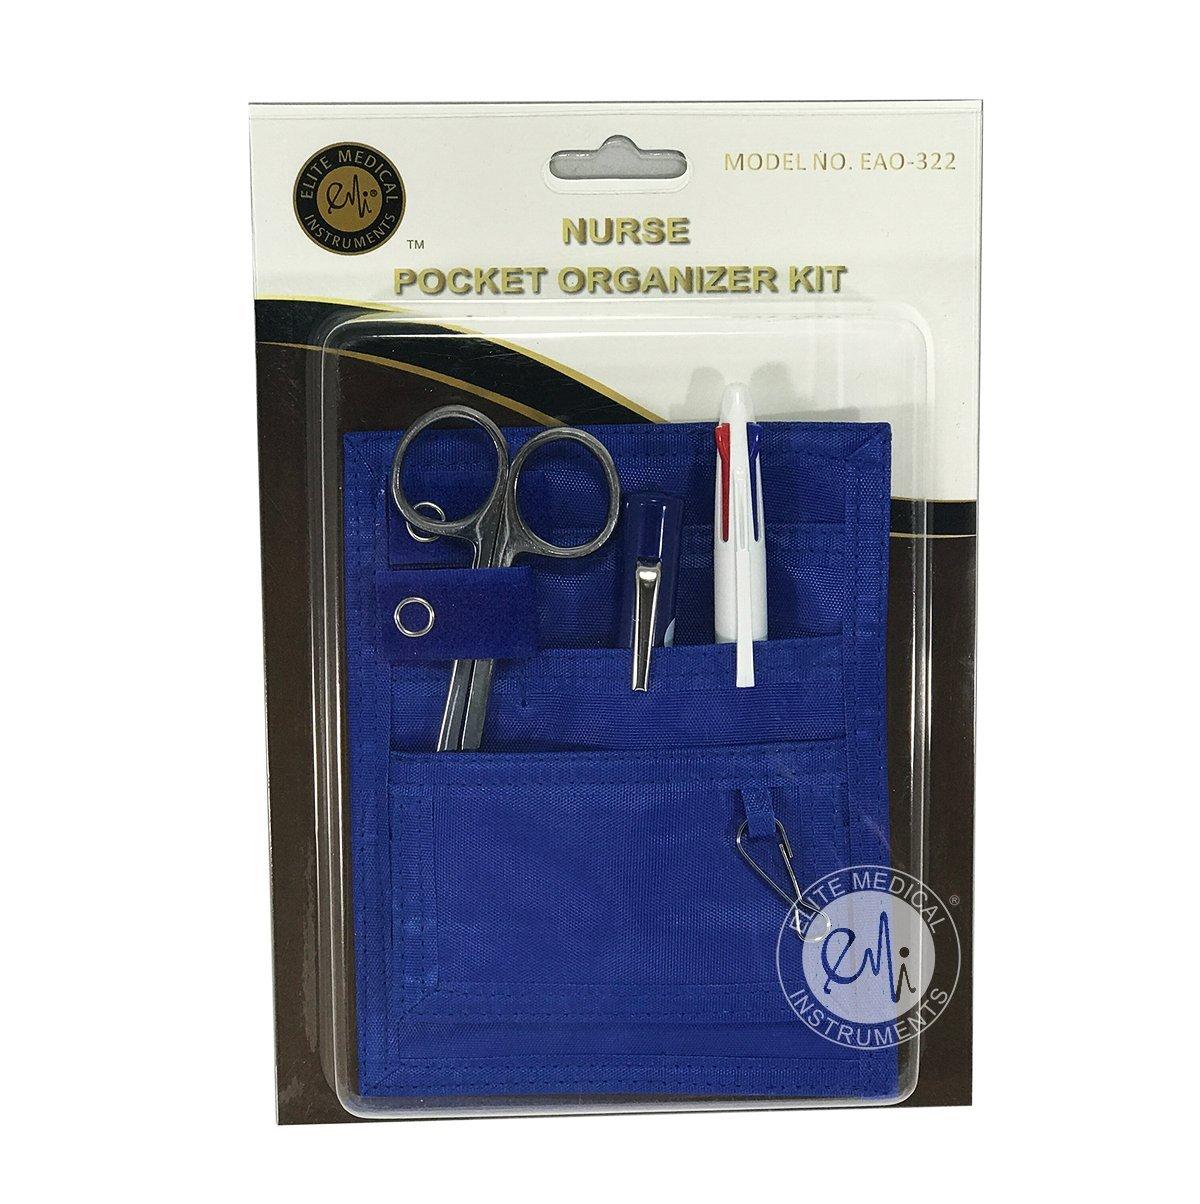 EMI Nurse Pocket BLUE Organizer 4 Piece Kit - Pocket organizer, Lister bandage scissor, Pupil gauge penlight, and chart pen